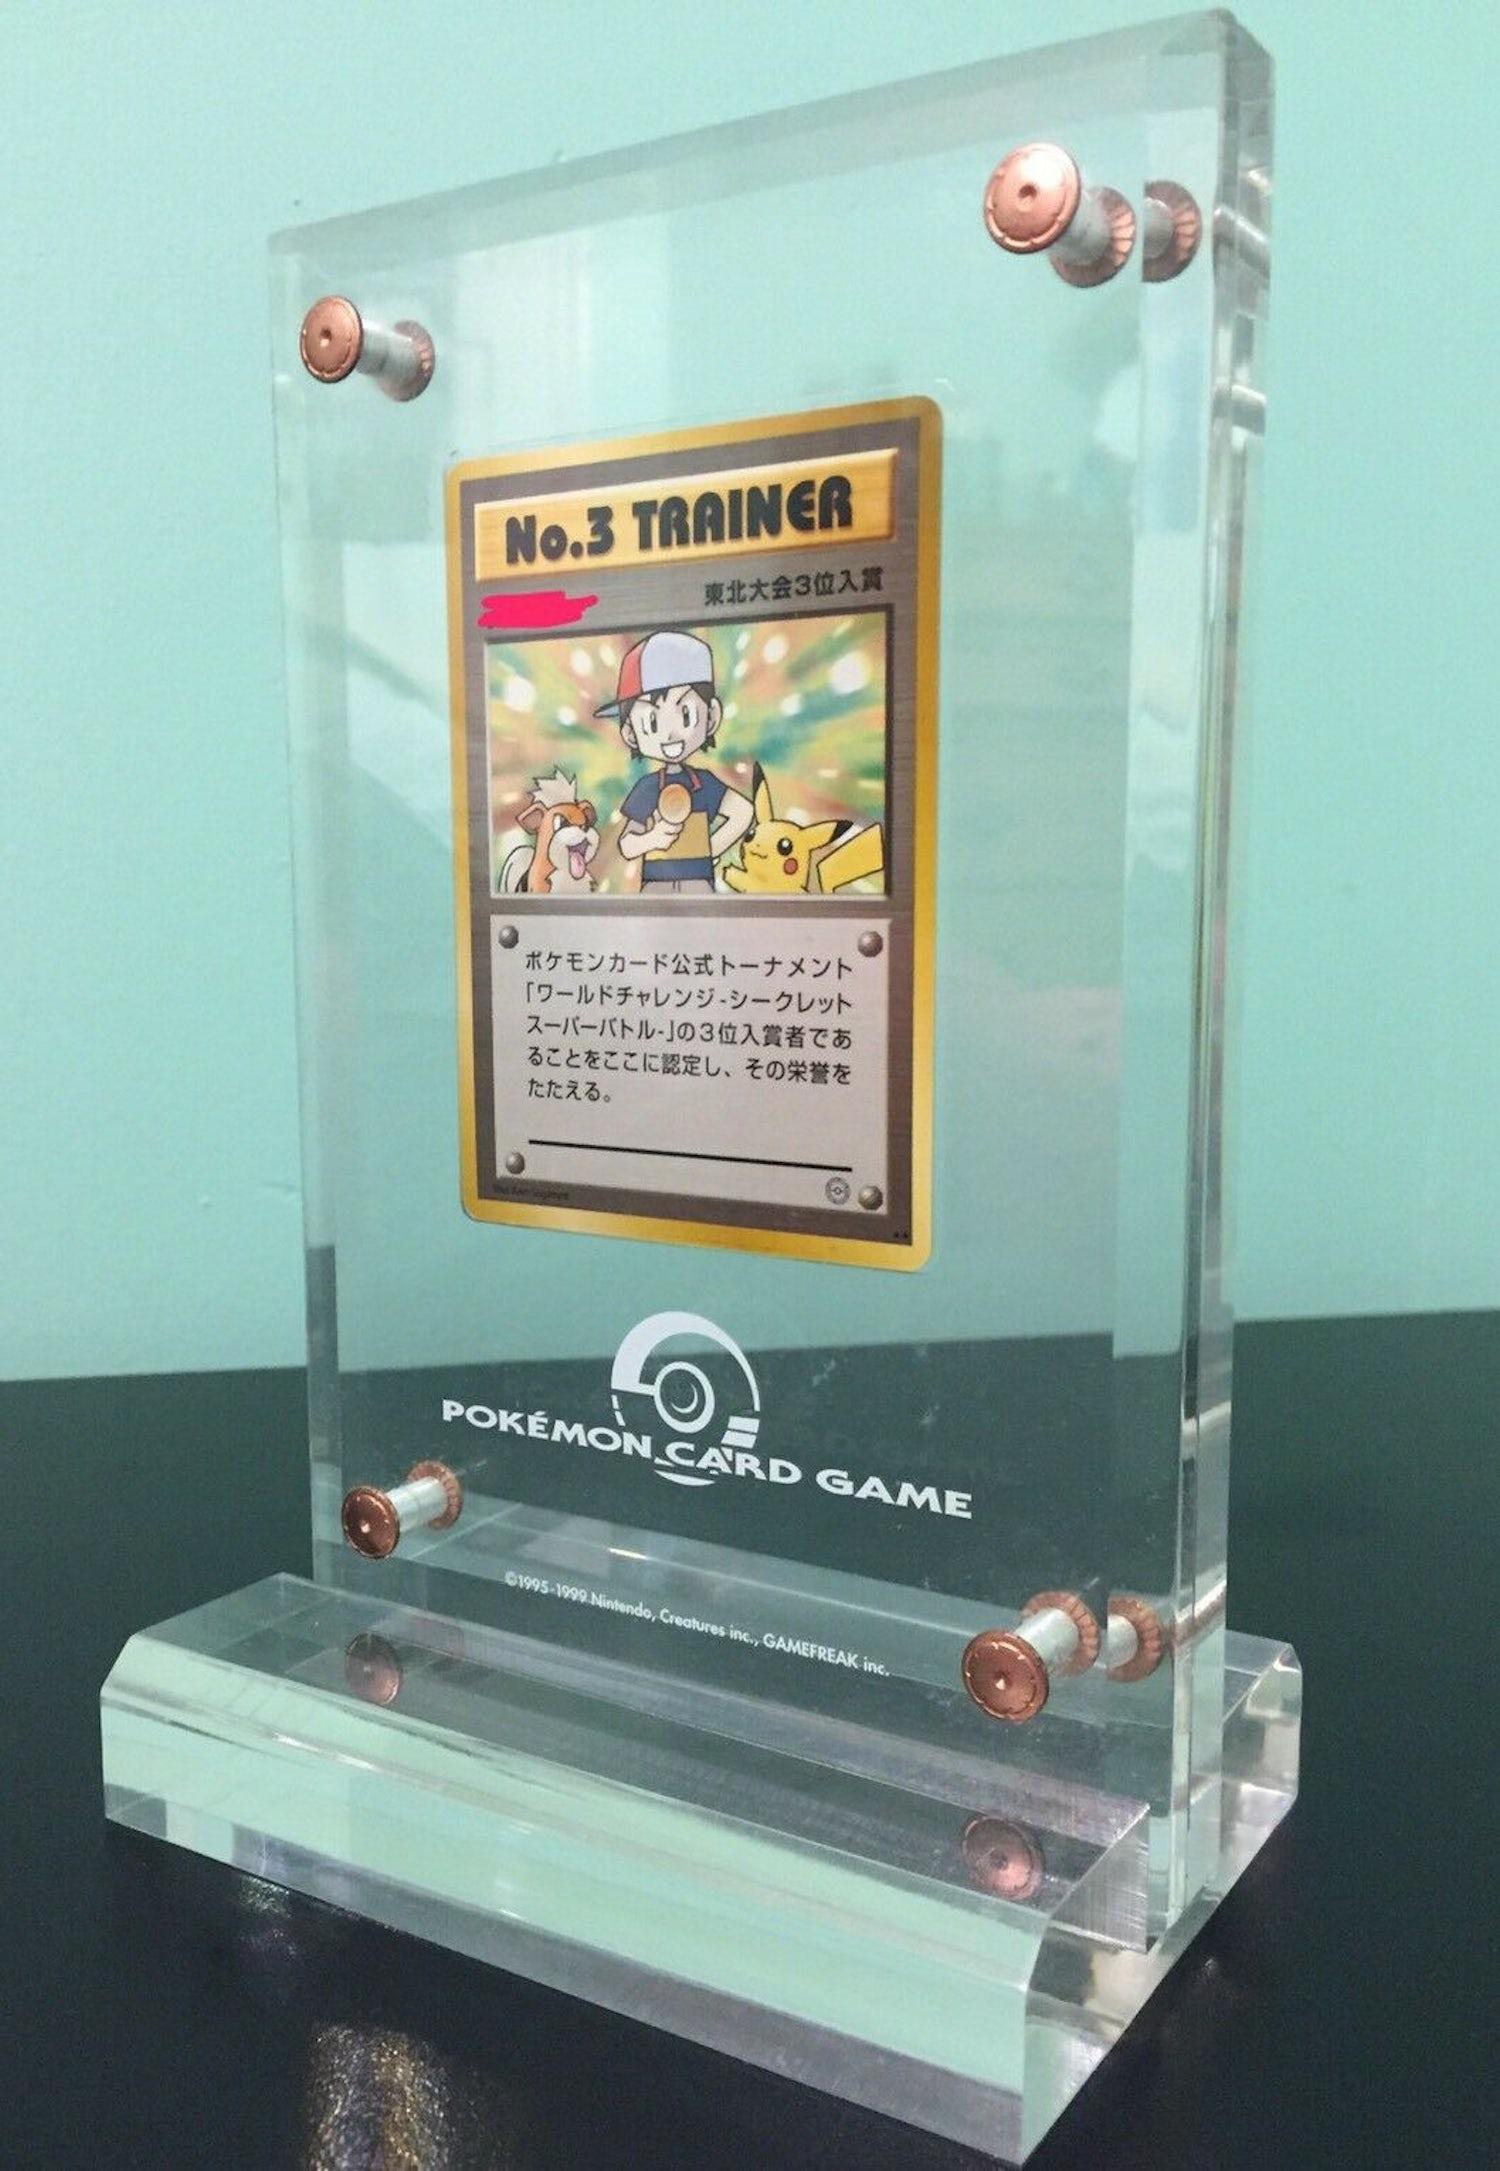 No3Trainer PokemonCard